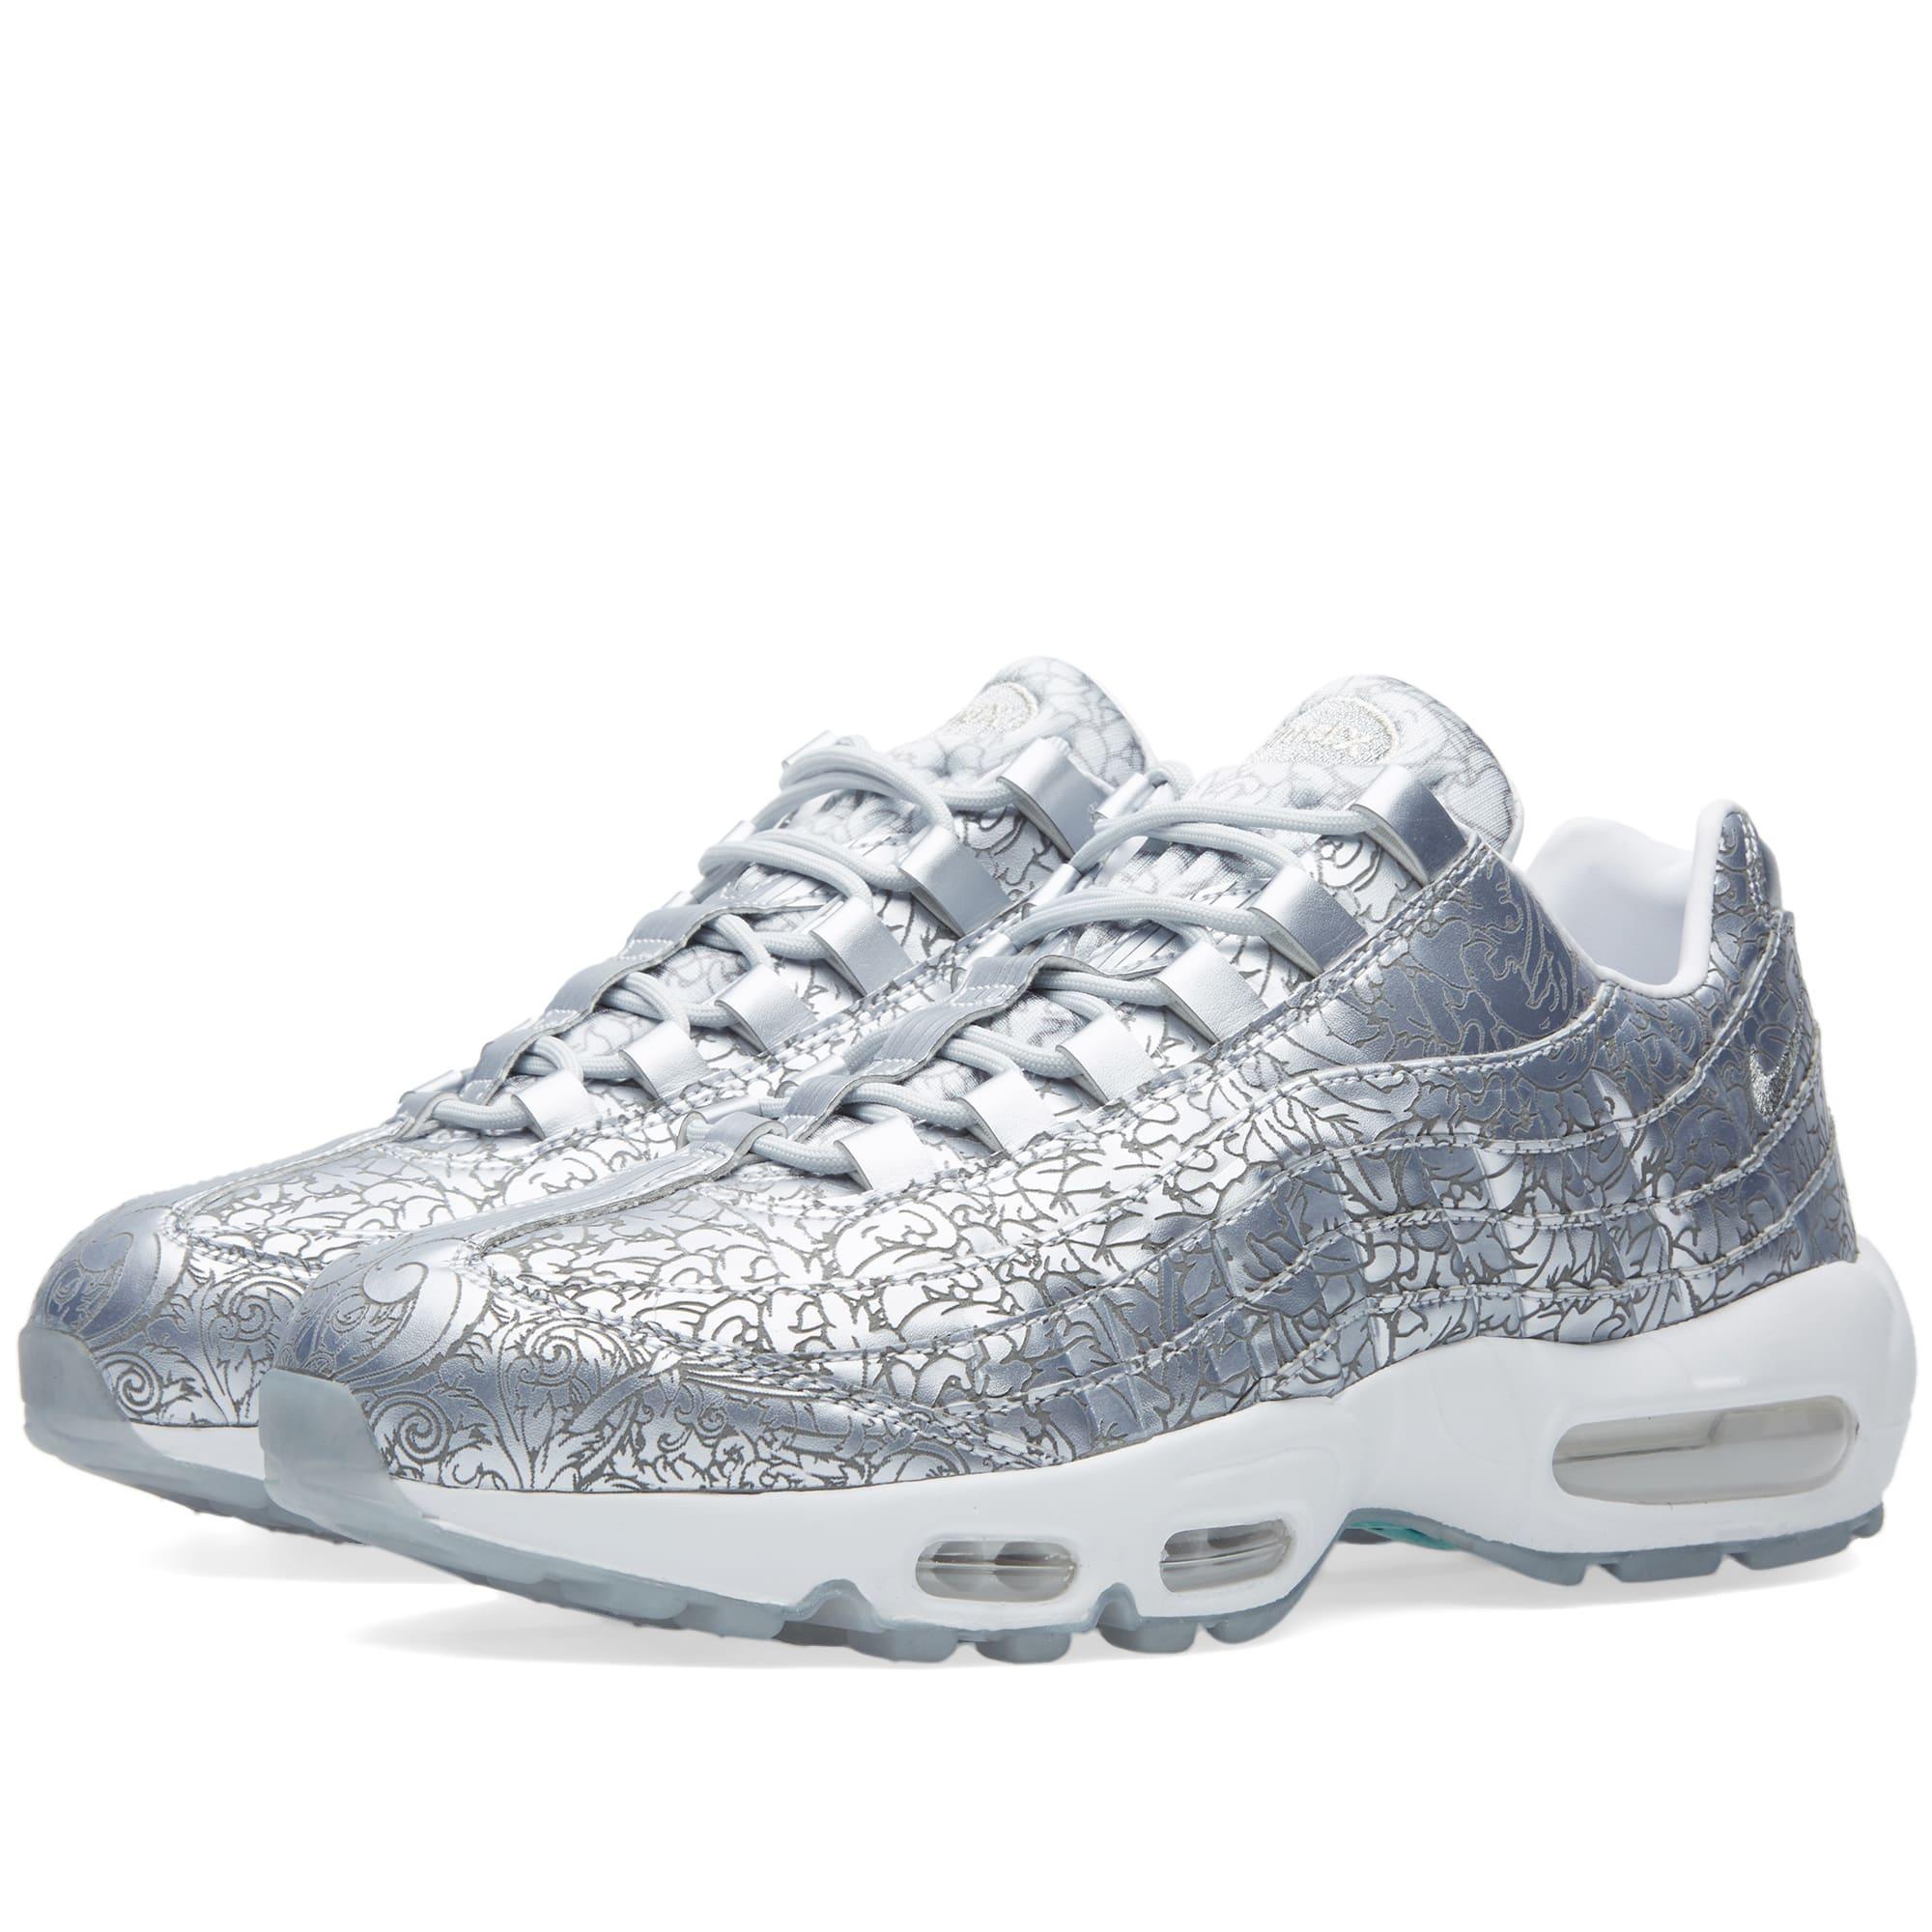 size 40 e3364 44441 Nike Air Max 95 Anniversary Pure Platinum   White   END.